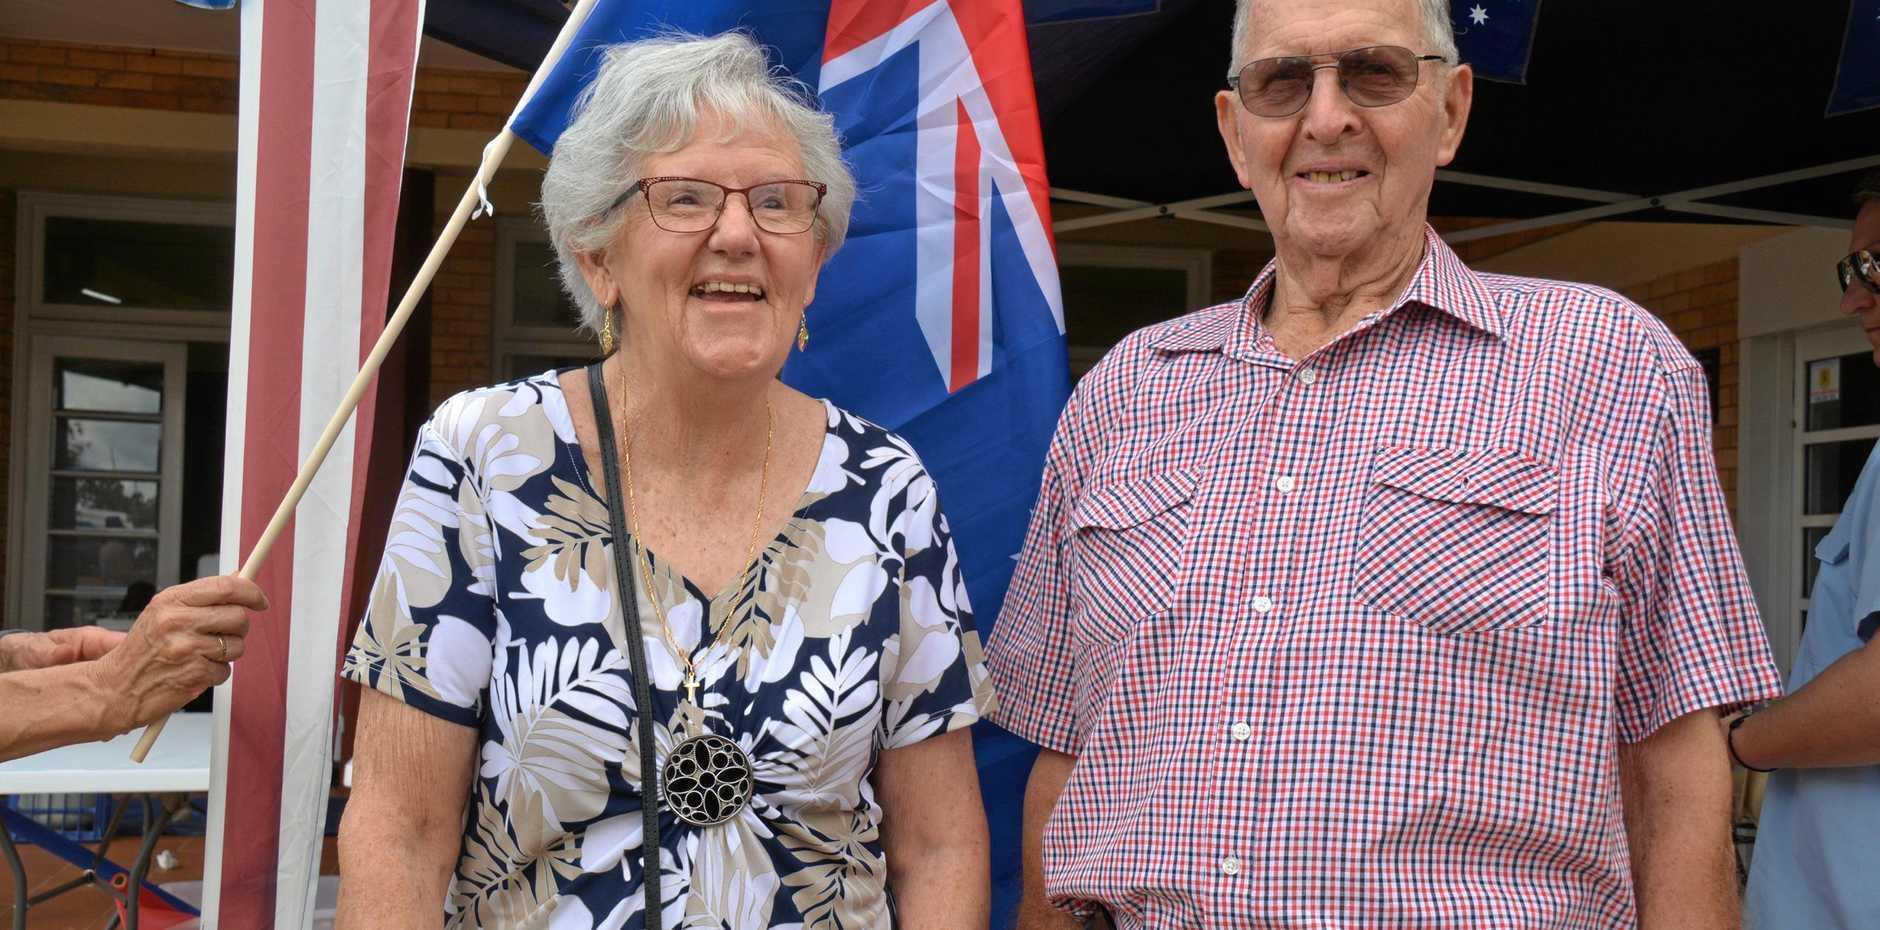 AWARDS: Wondai's OAM recipients Elaine Madill and Roy Radunz at the 2019 Wondai Australia Day breakfast on January 26.